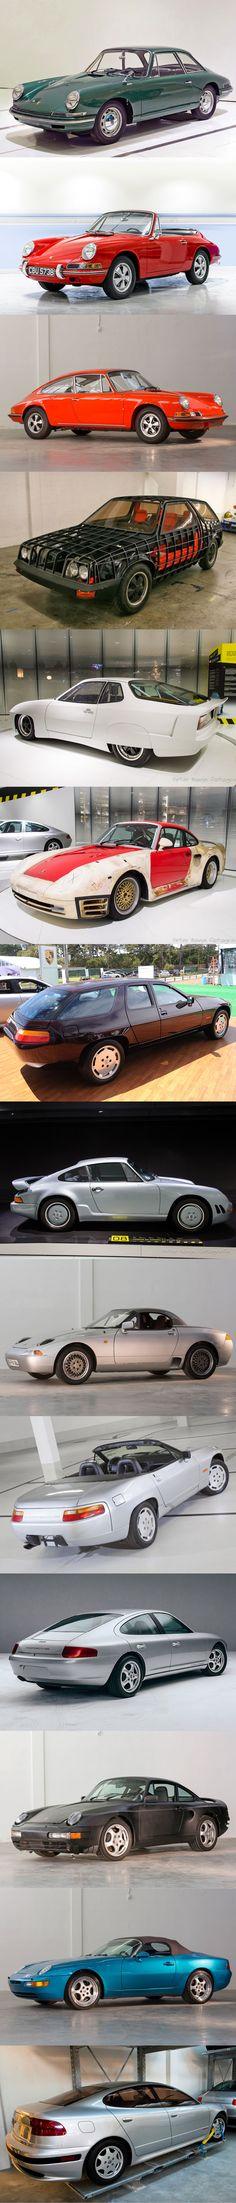 Secret Porsche / 1959 754 / 1964 901 Cabriolet / 1970 915 / 1973 FLA / 1976 924 World Record / 1982 959 C29 / 1984 928 H50 / 911 E19 / 1985 984 Junior / 1987 928 Cabriolet / 1988 989 / 969 / 1992 932 Panamera II / Germany / concept / prototype